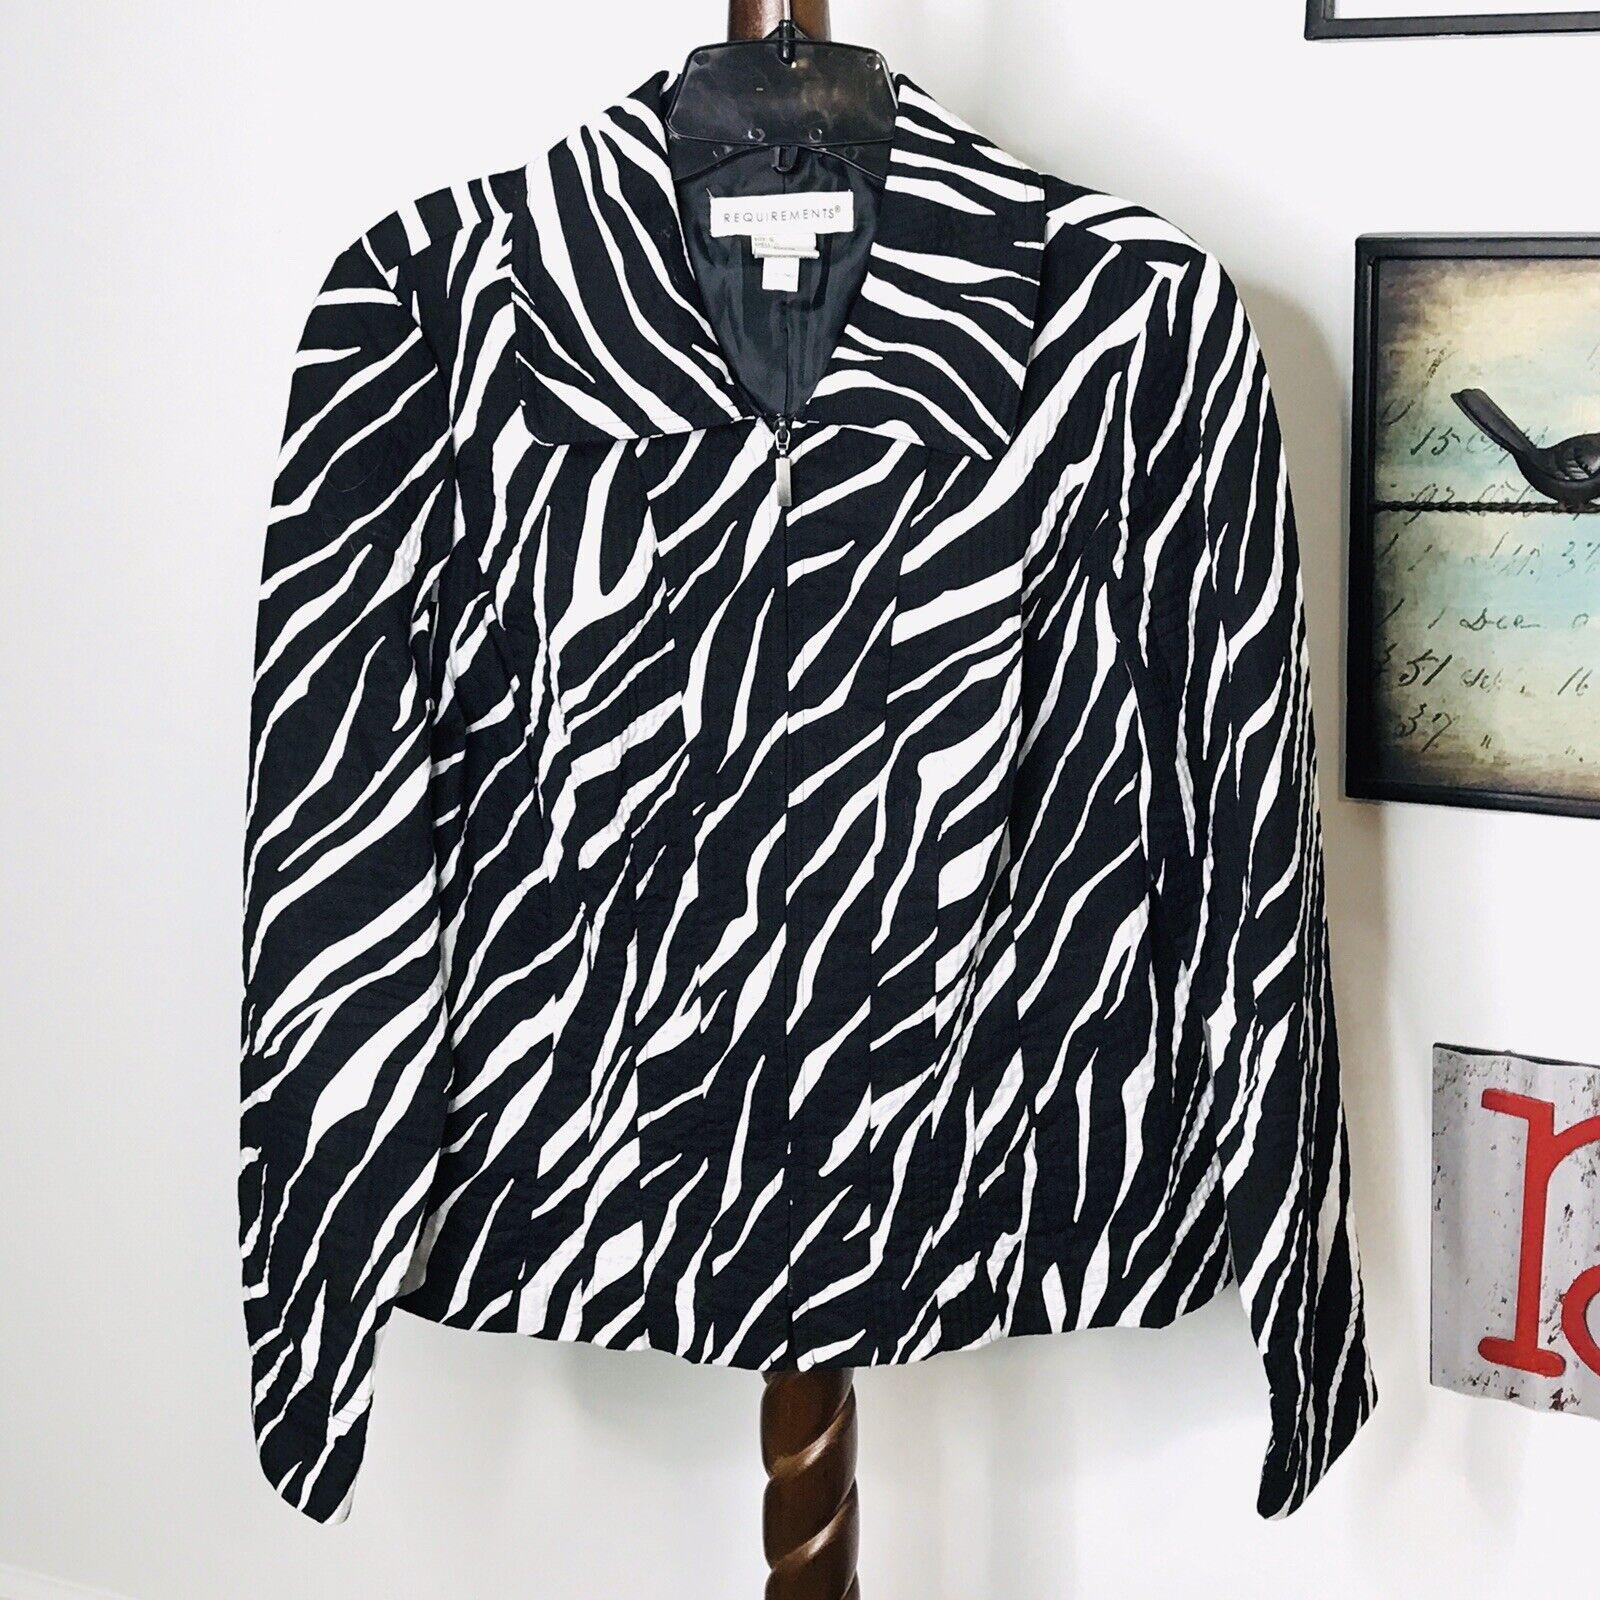 Requirements Women's S Black White Zebra Print Full Zip Collared Jacket